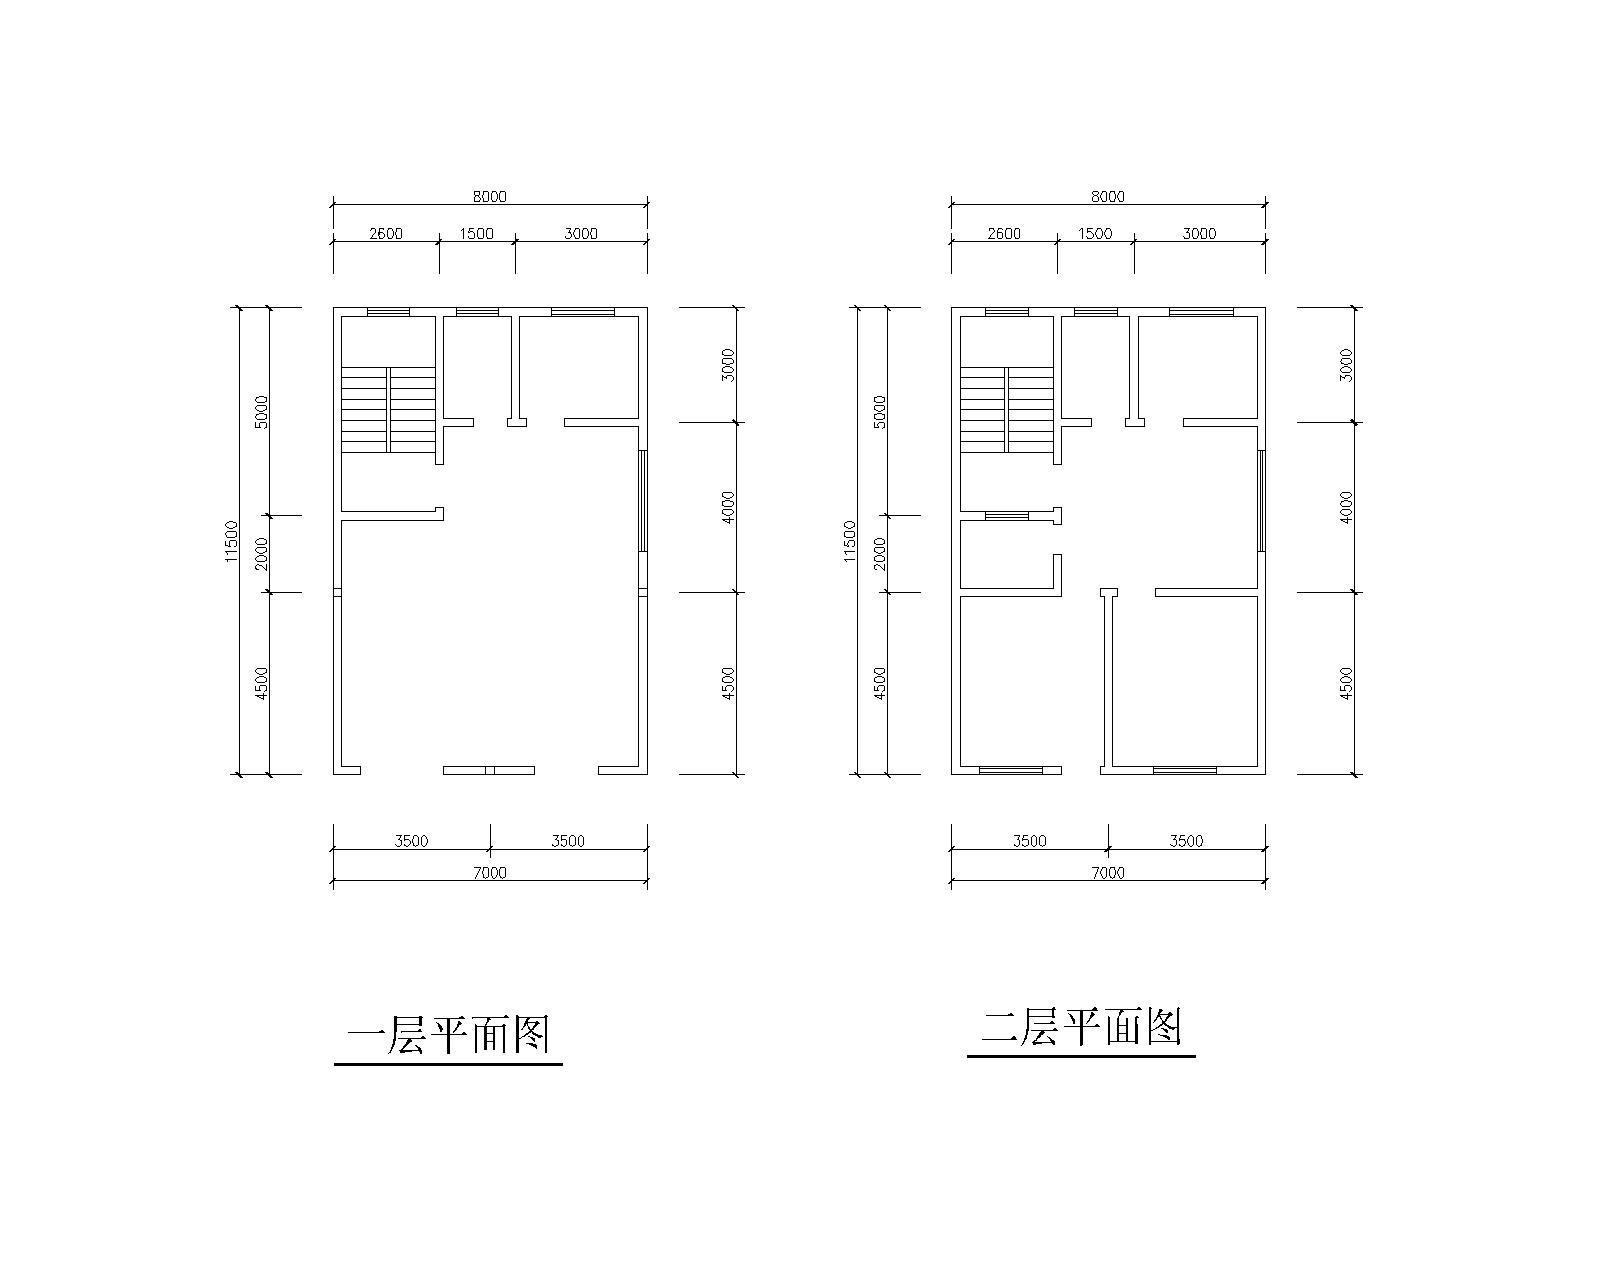 设计农村住房图纸cad